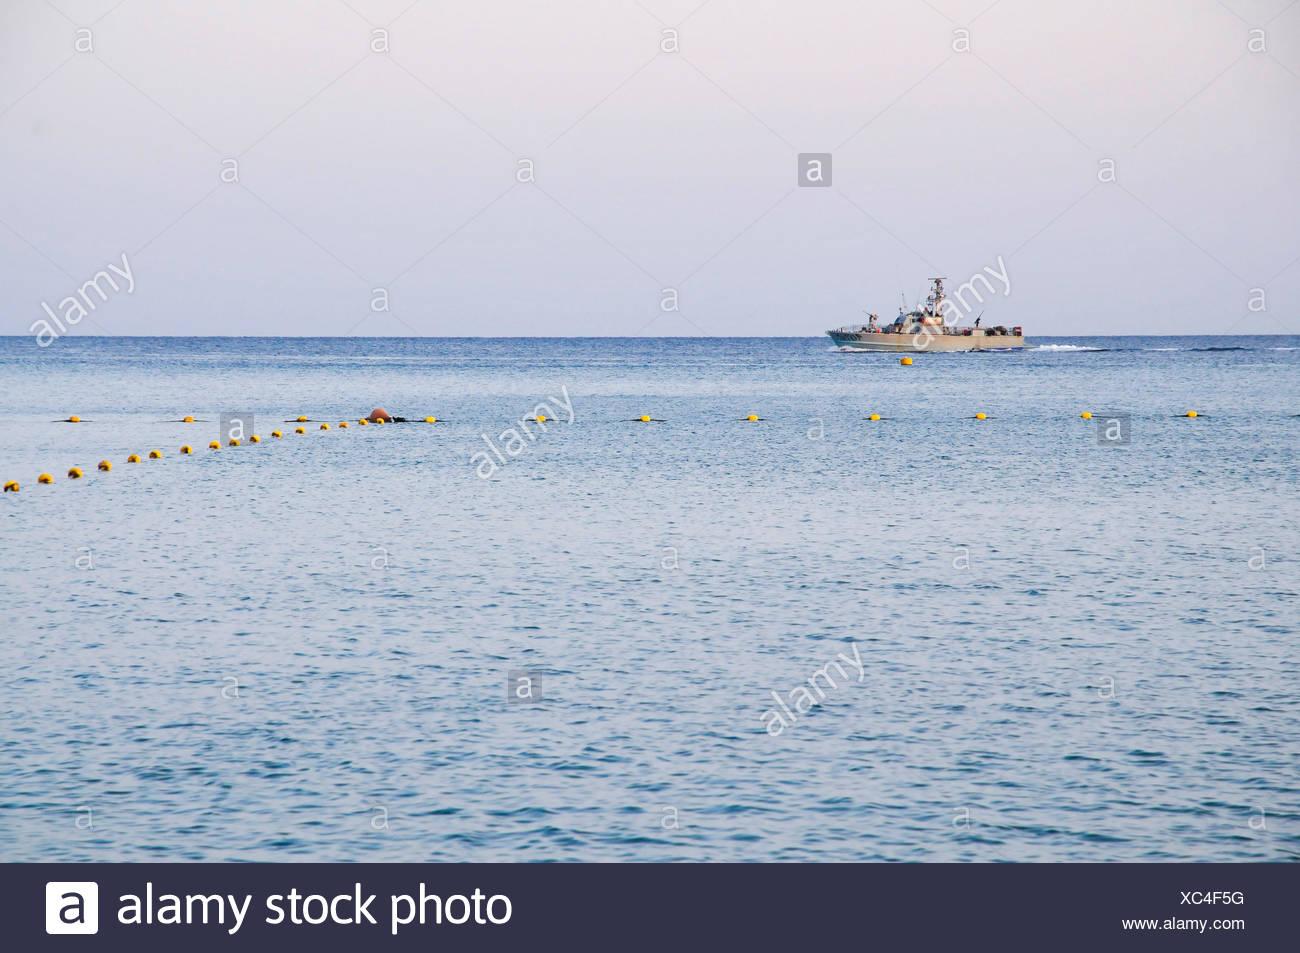 Israel, Eilat, Israeli navy Dabur class patrol boat in the